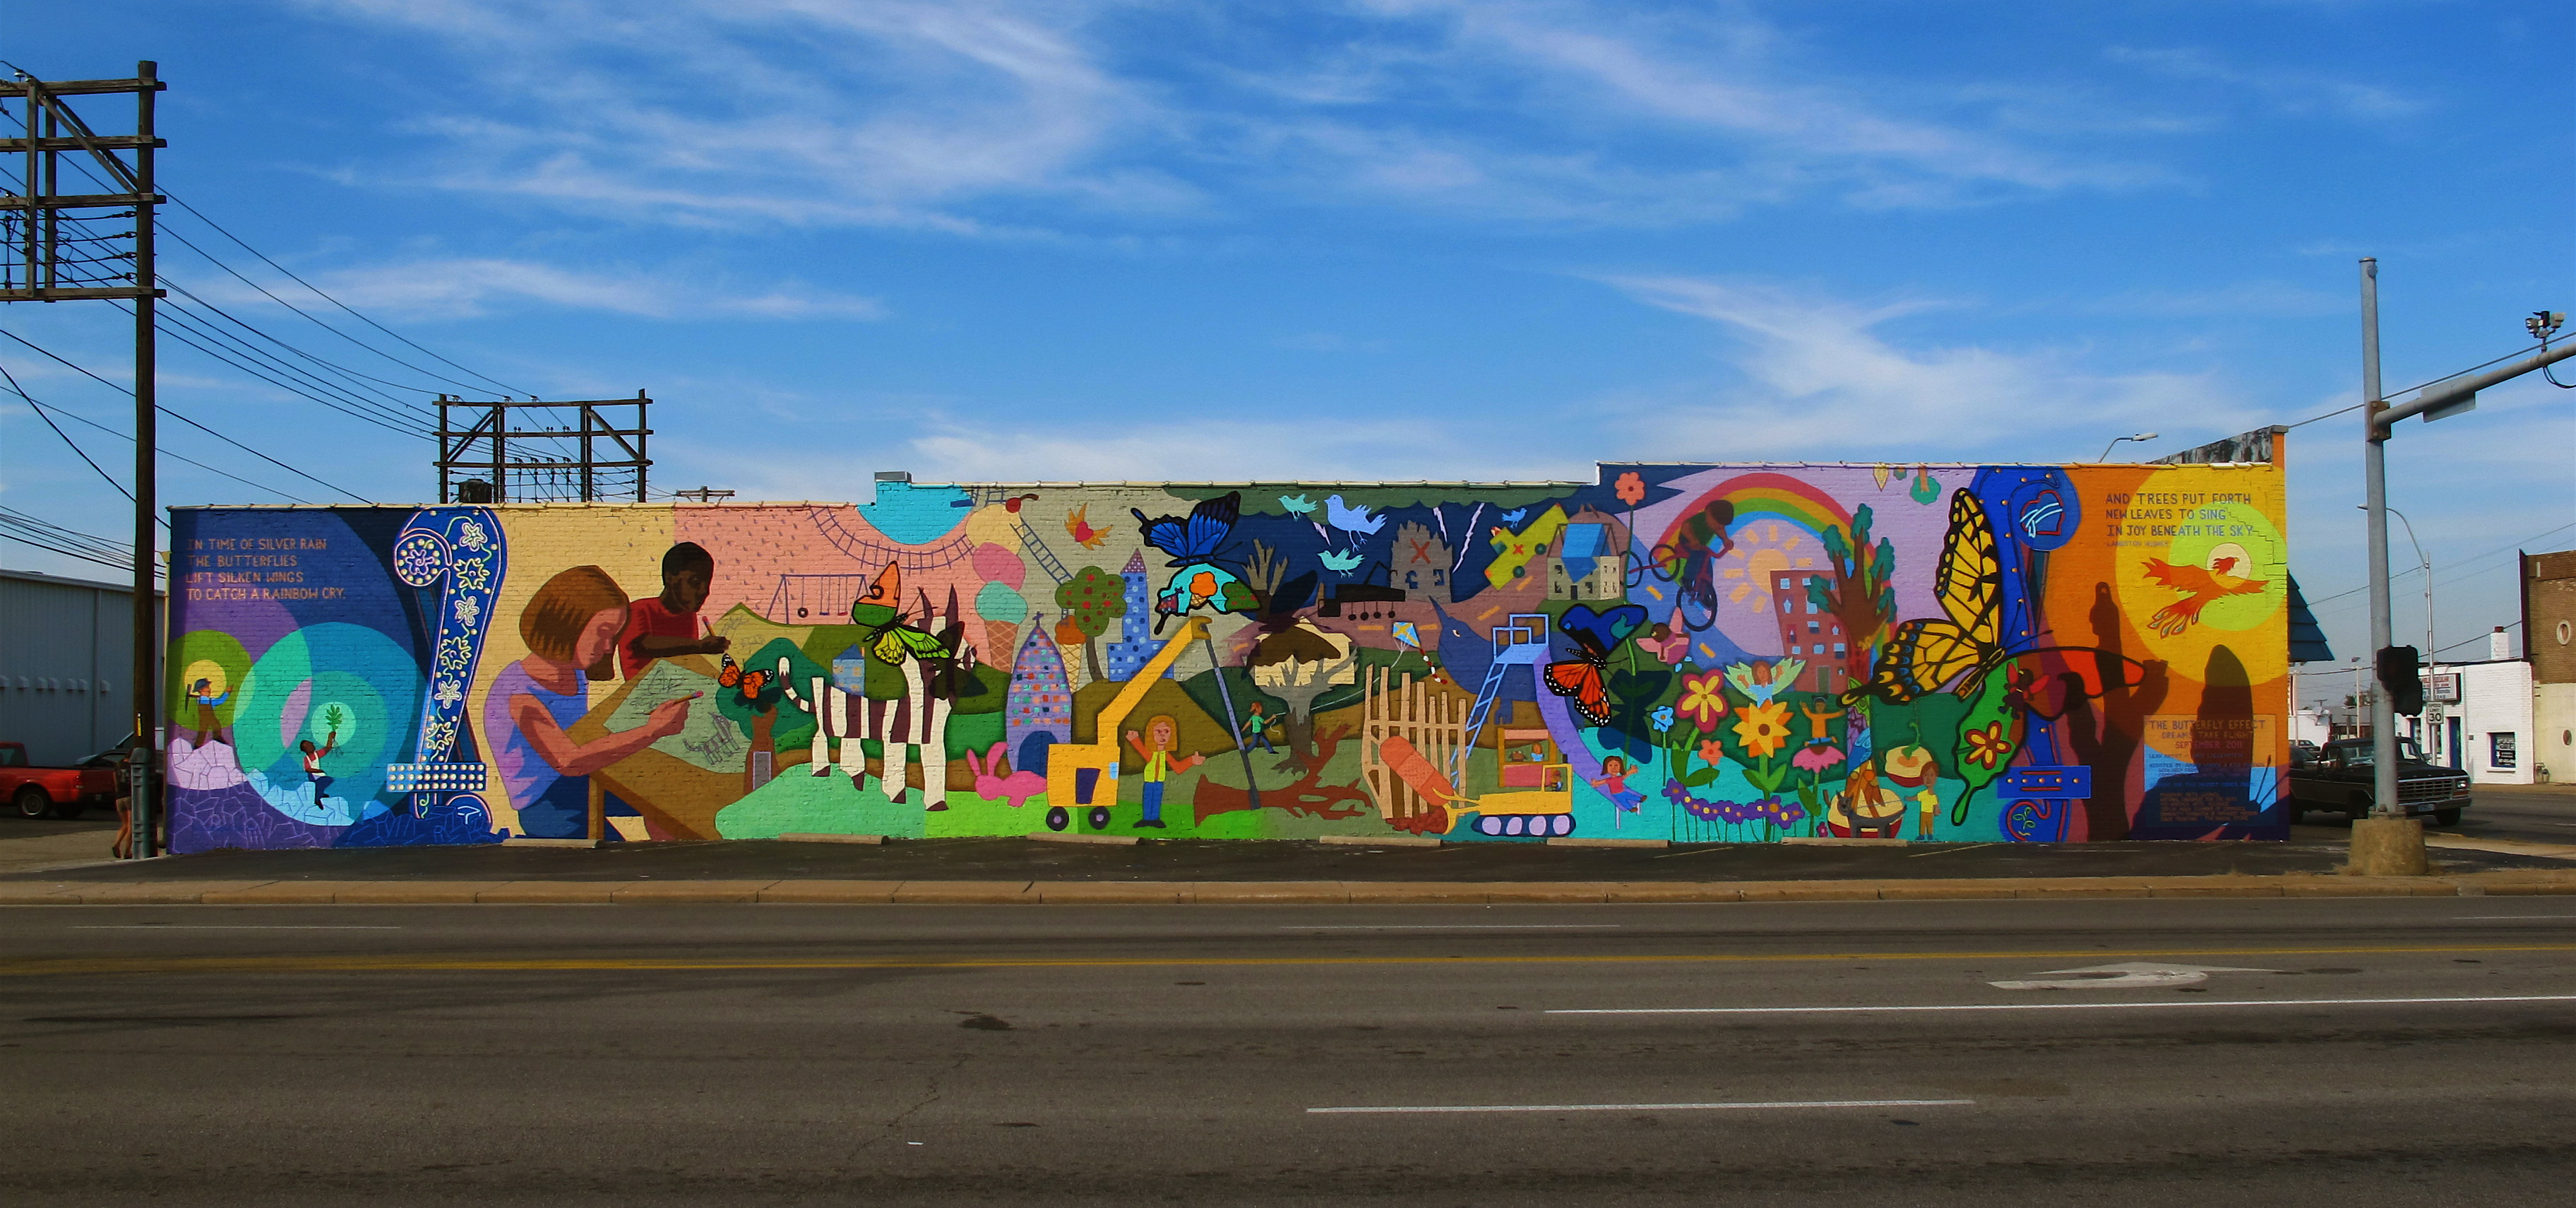 Public art joplin mo official website for Butterfly mural ideas